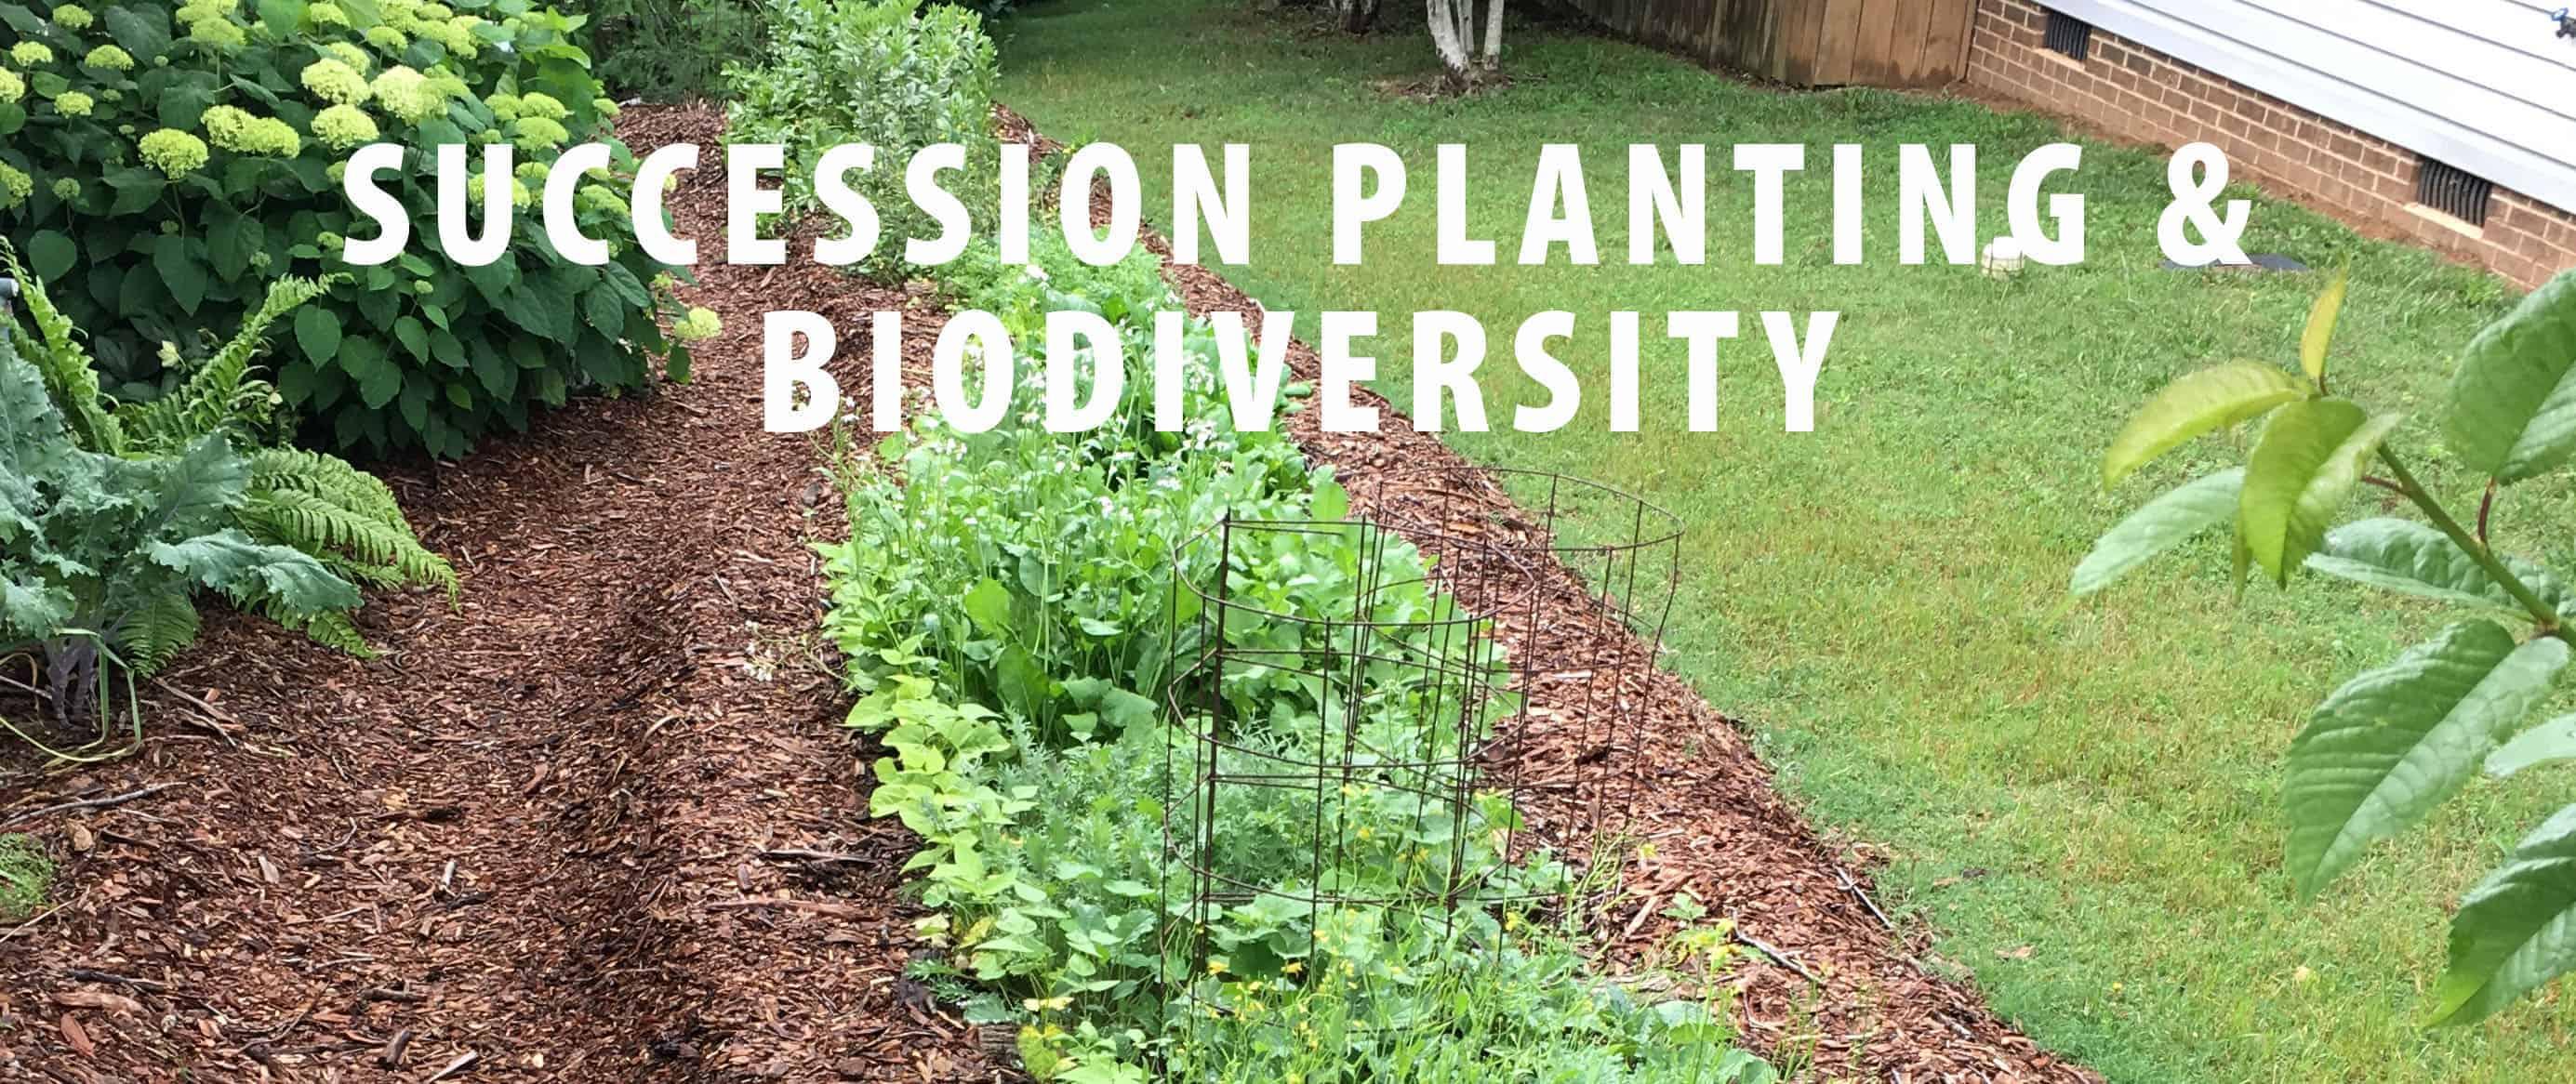 New Video Succession Planting Biodiversity